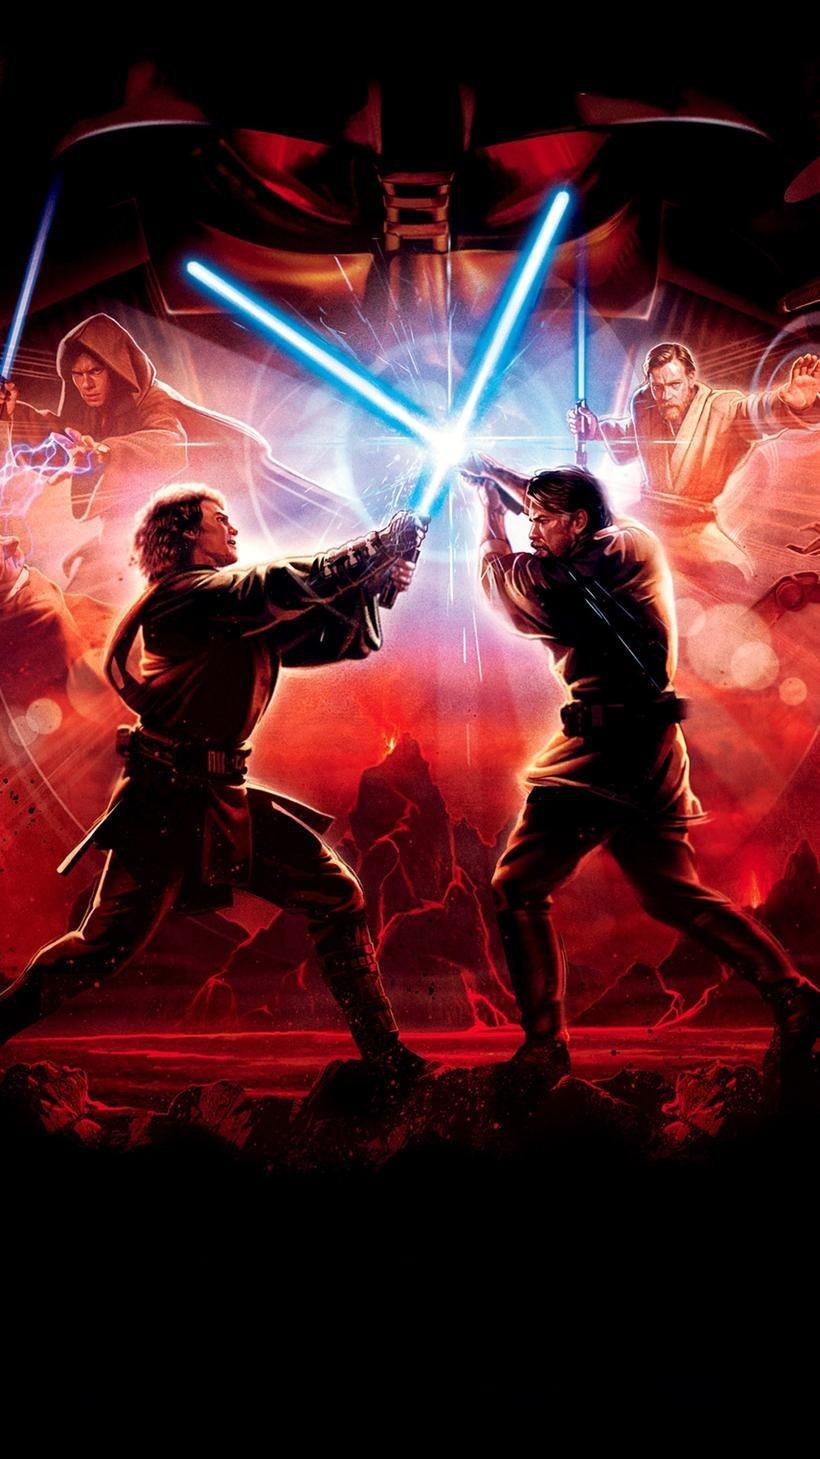 Star Wars Episode III Revenge of the Sith (2005) Phone